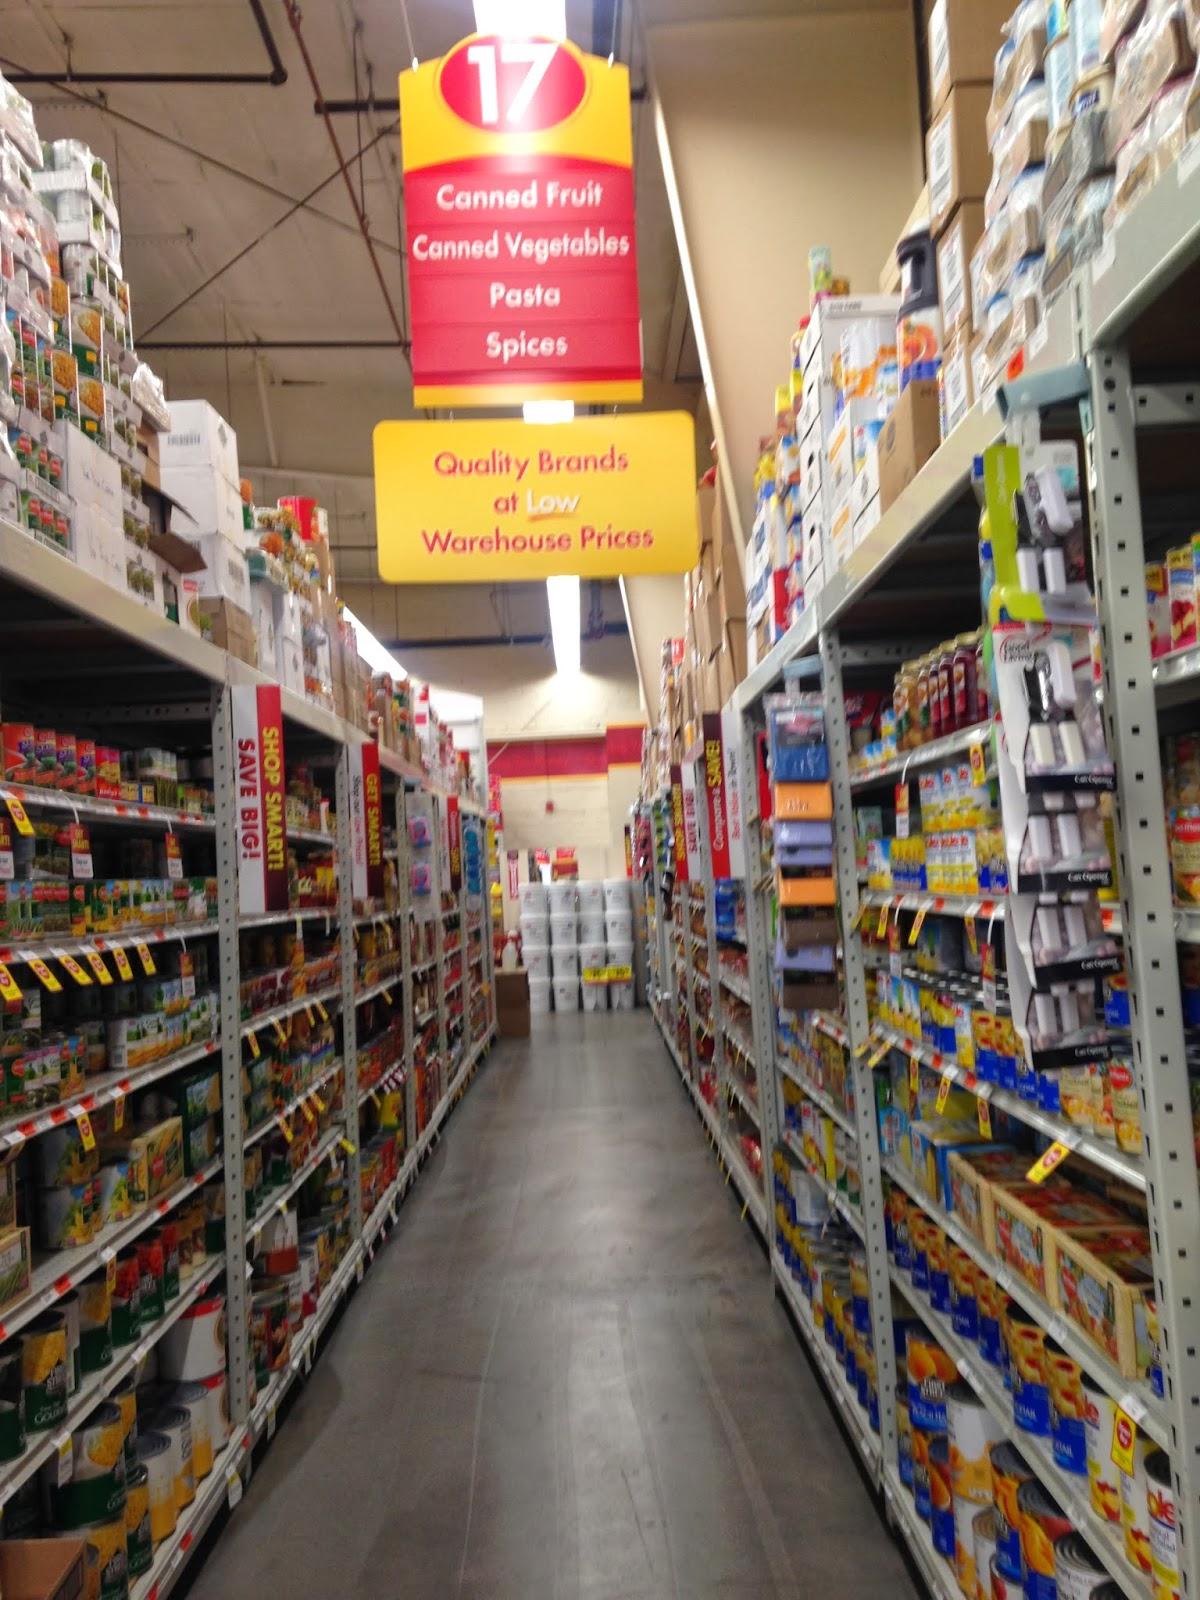 #ChooseSmart, #CBias, #Shop